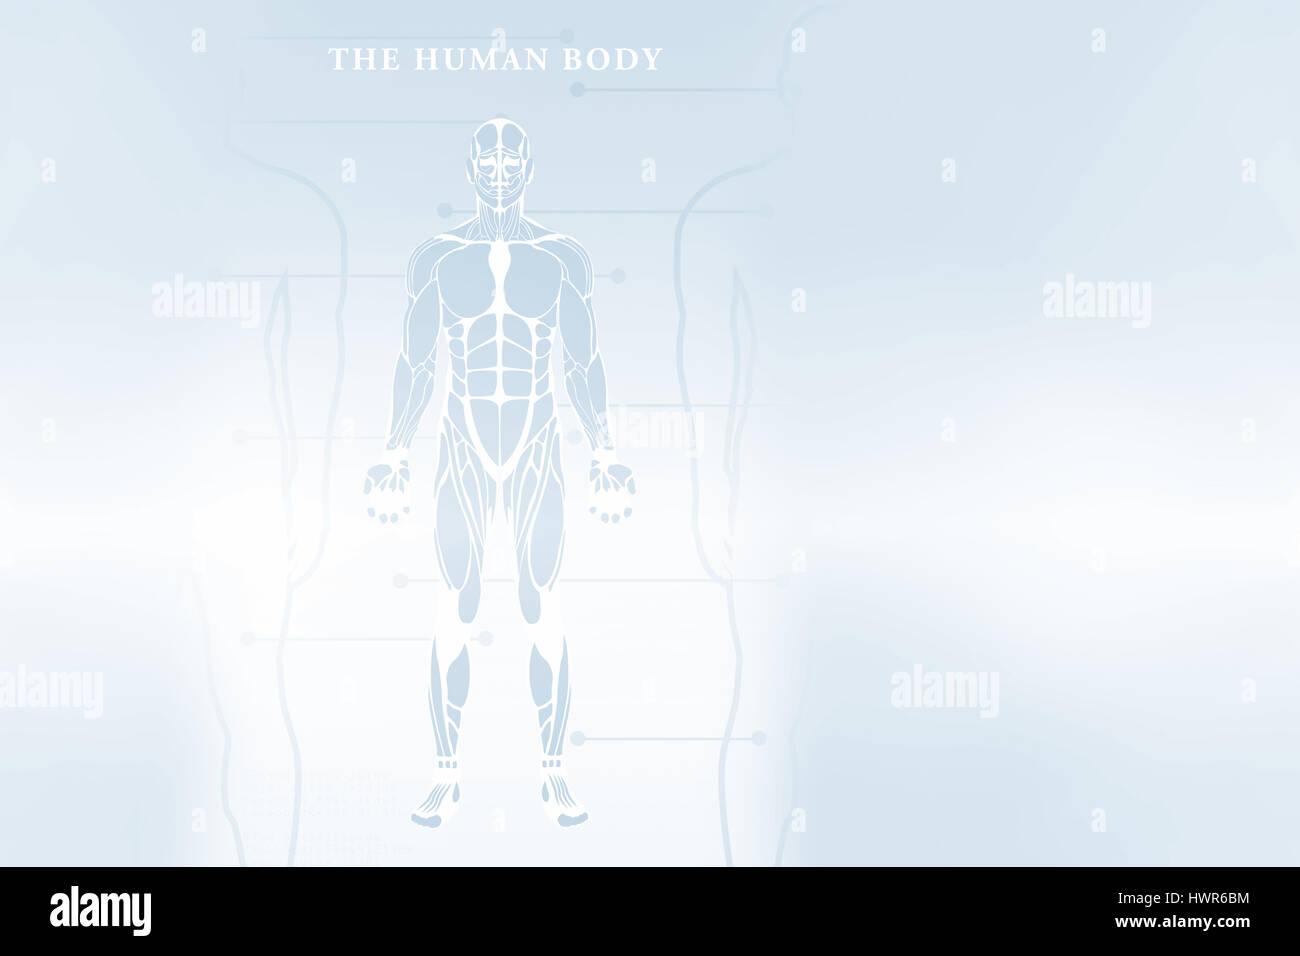 Human Body Diagram Stockfotos & Human Body Diagram Bilder - Alamy